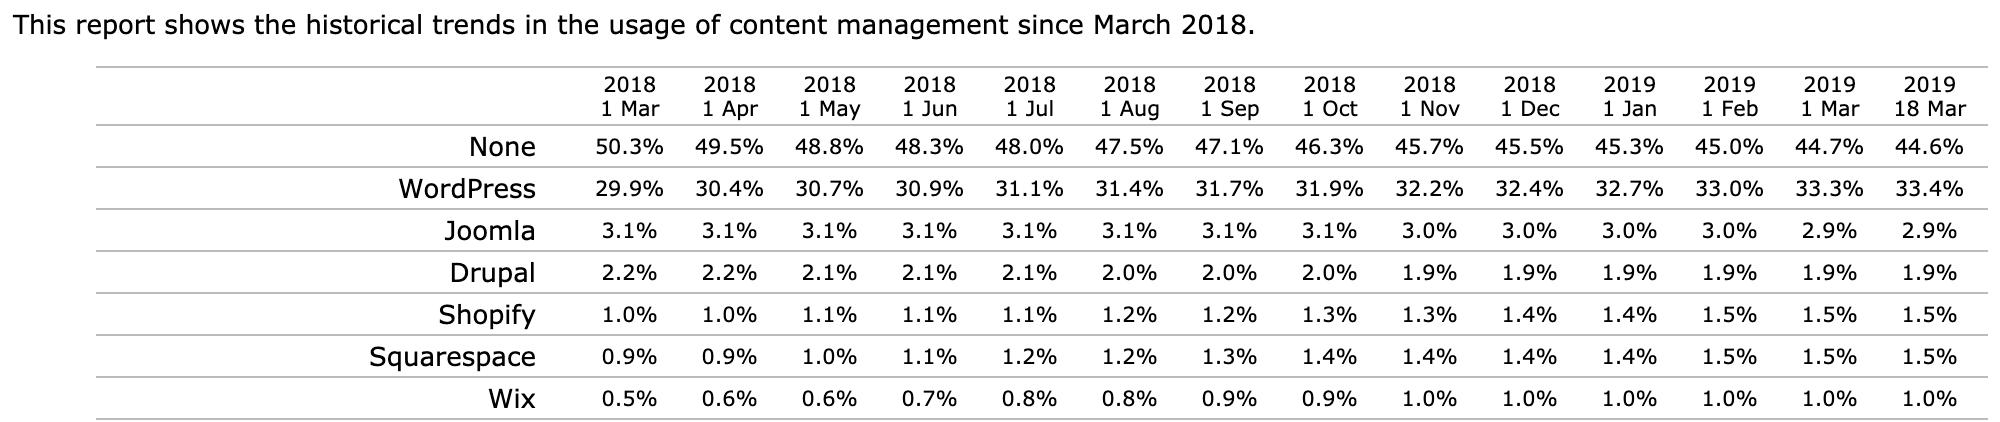 usage of CMS since 2018-2019